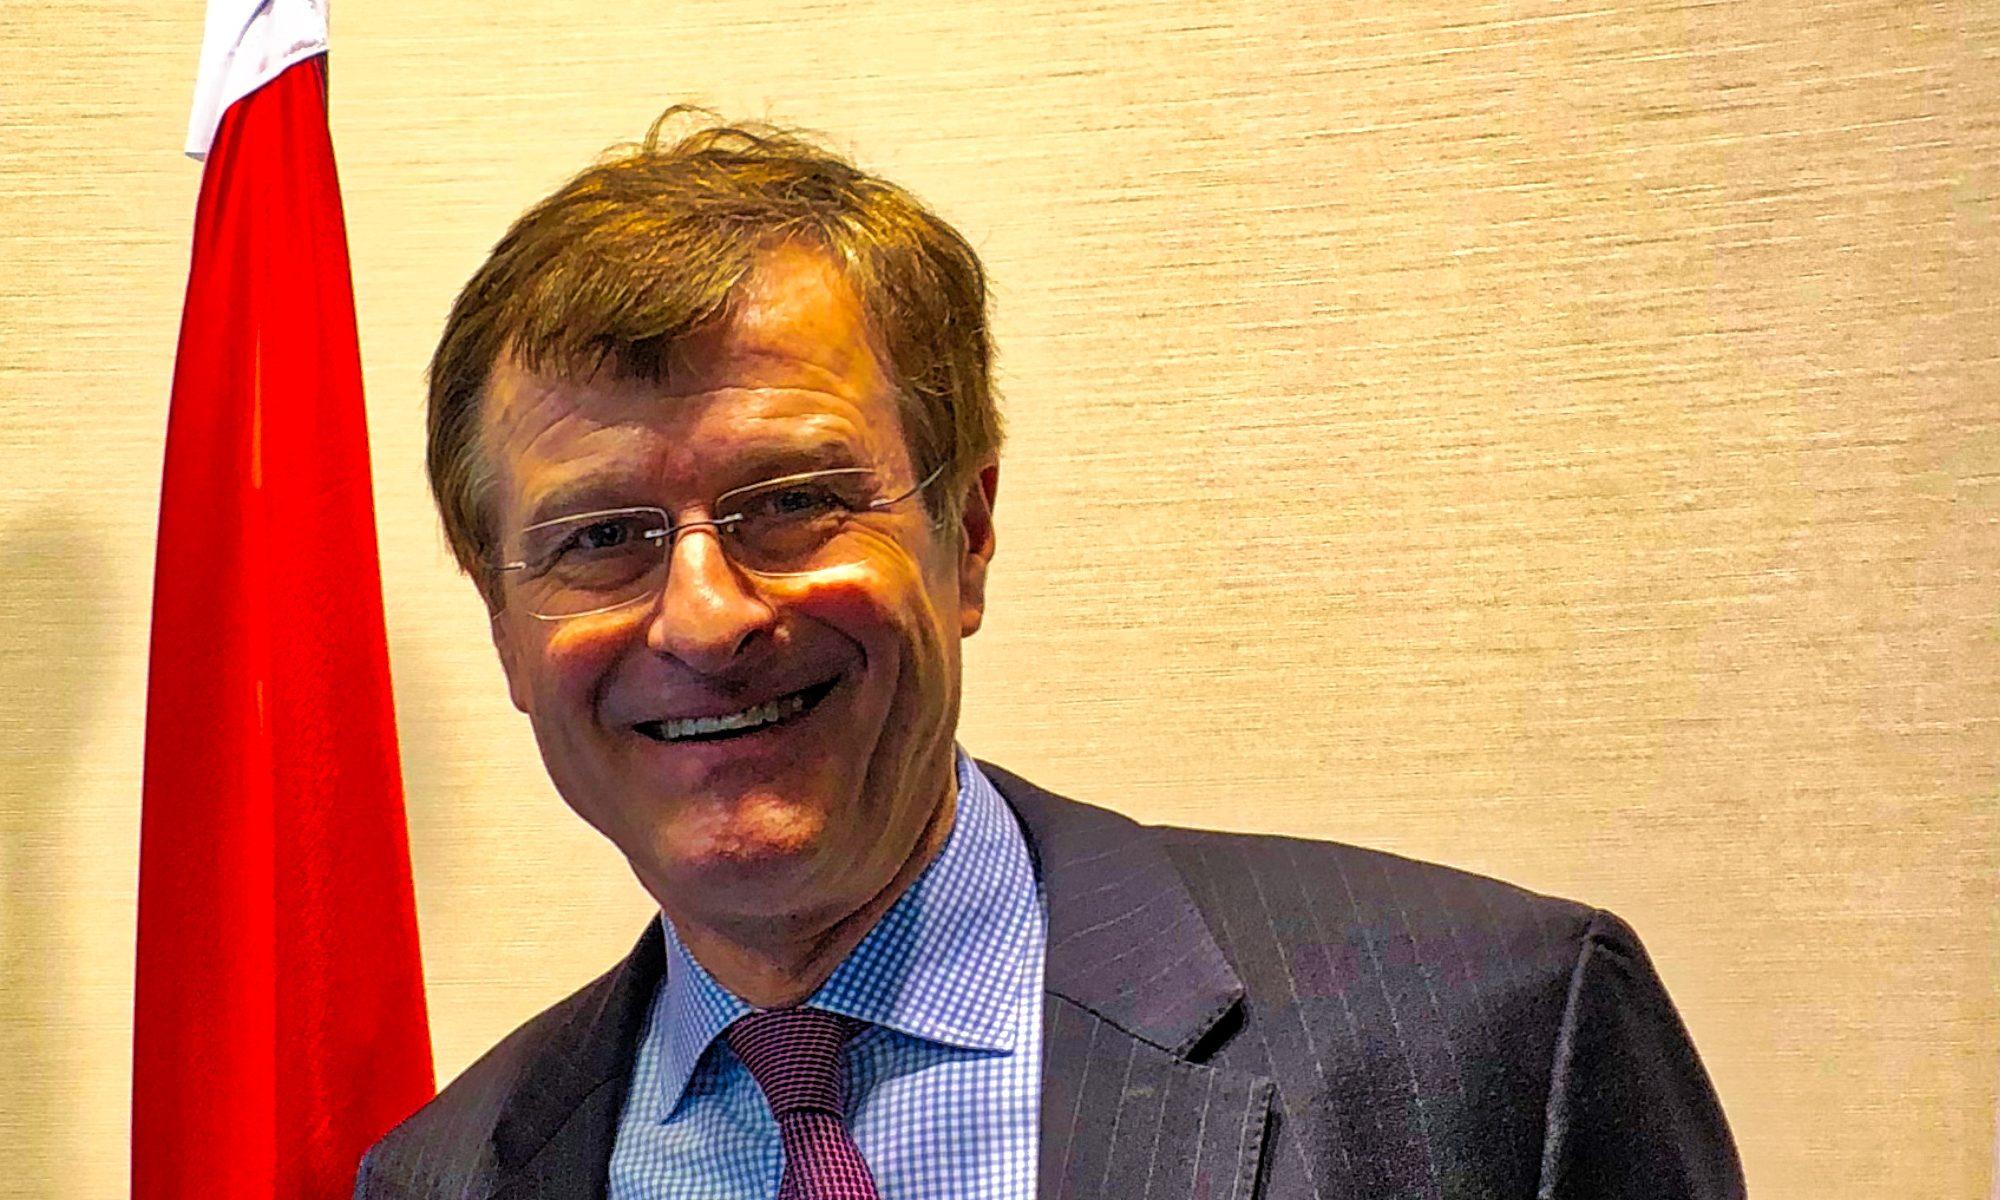 Gerhard Fasol CEO, Eurotechnology Japan KK, Board Director, GMO Cloud KK. former faculty Cambridge University and past Fellow, Trinity College Cambridge